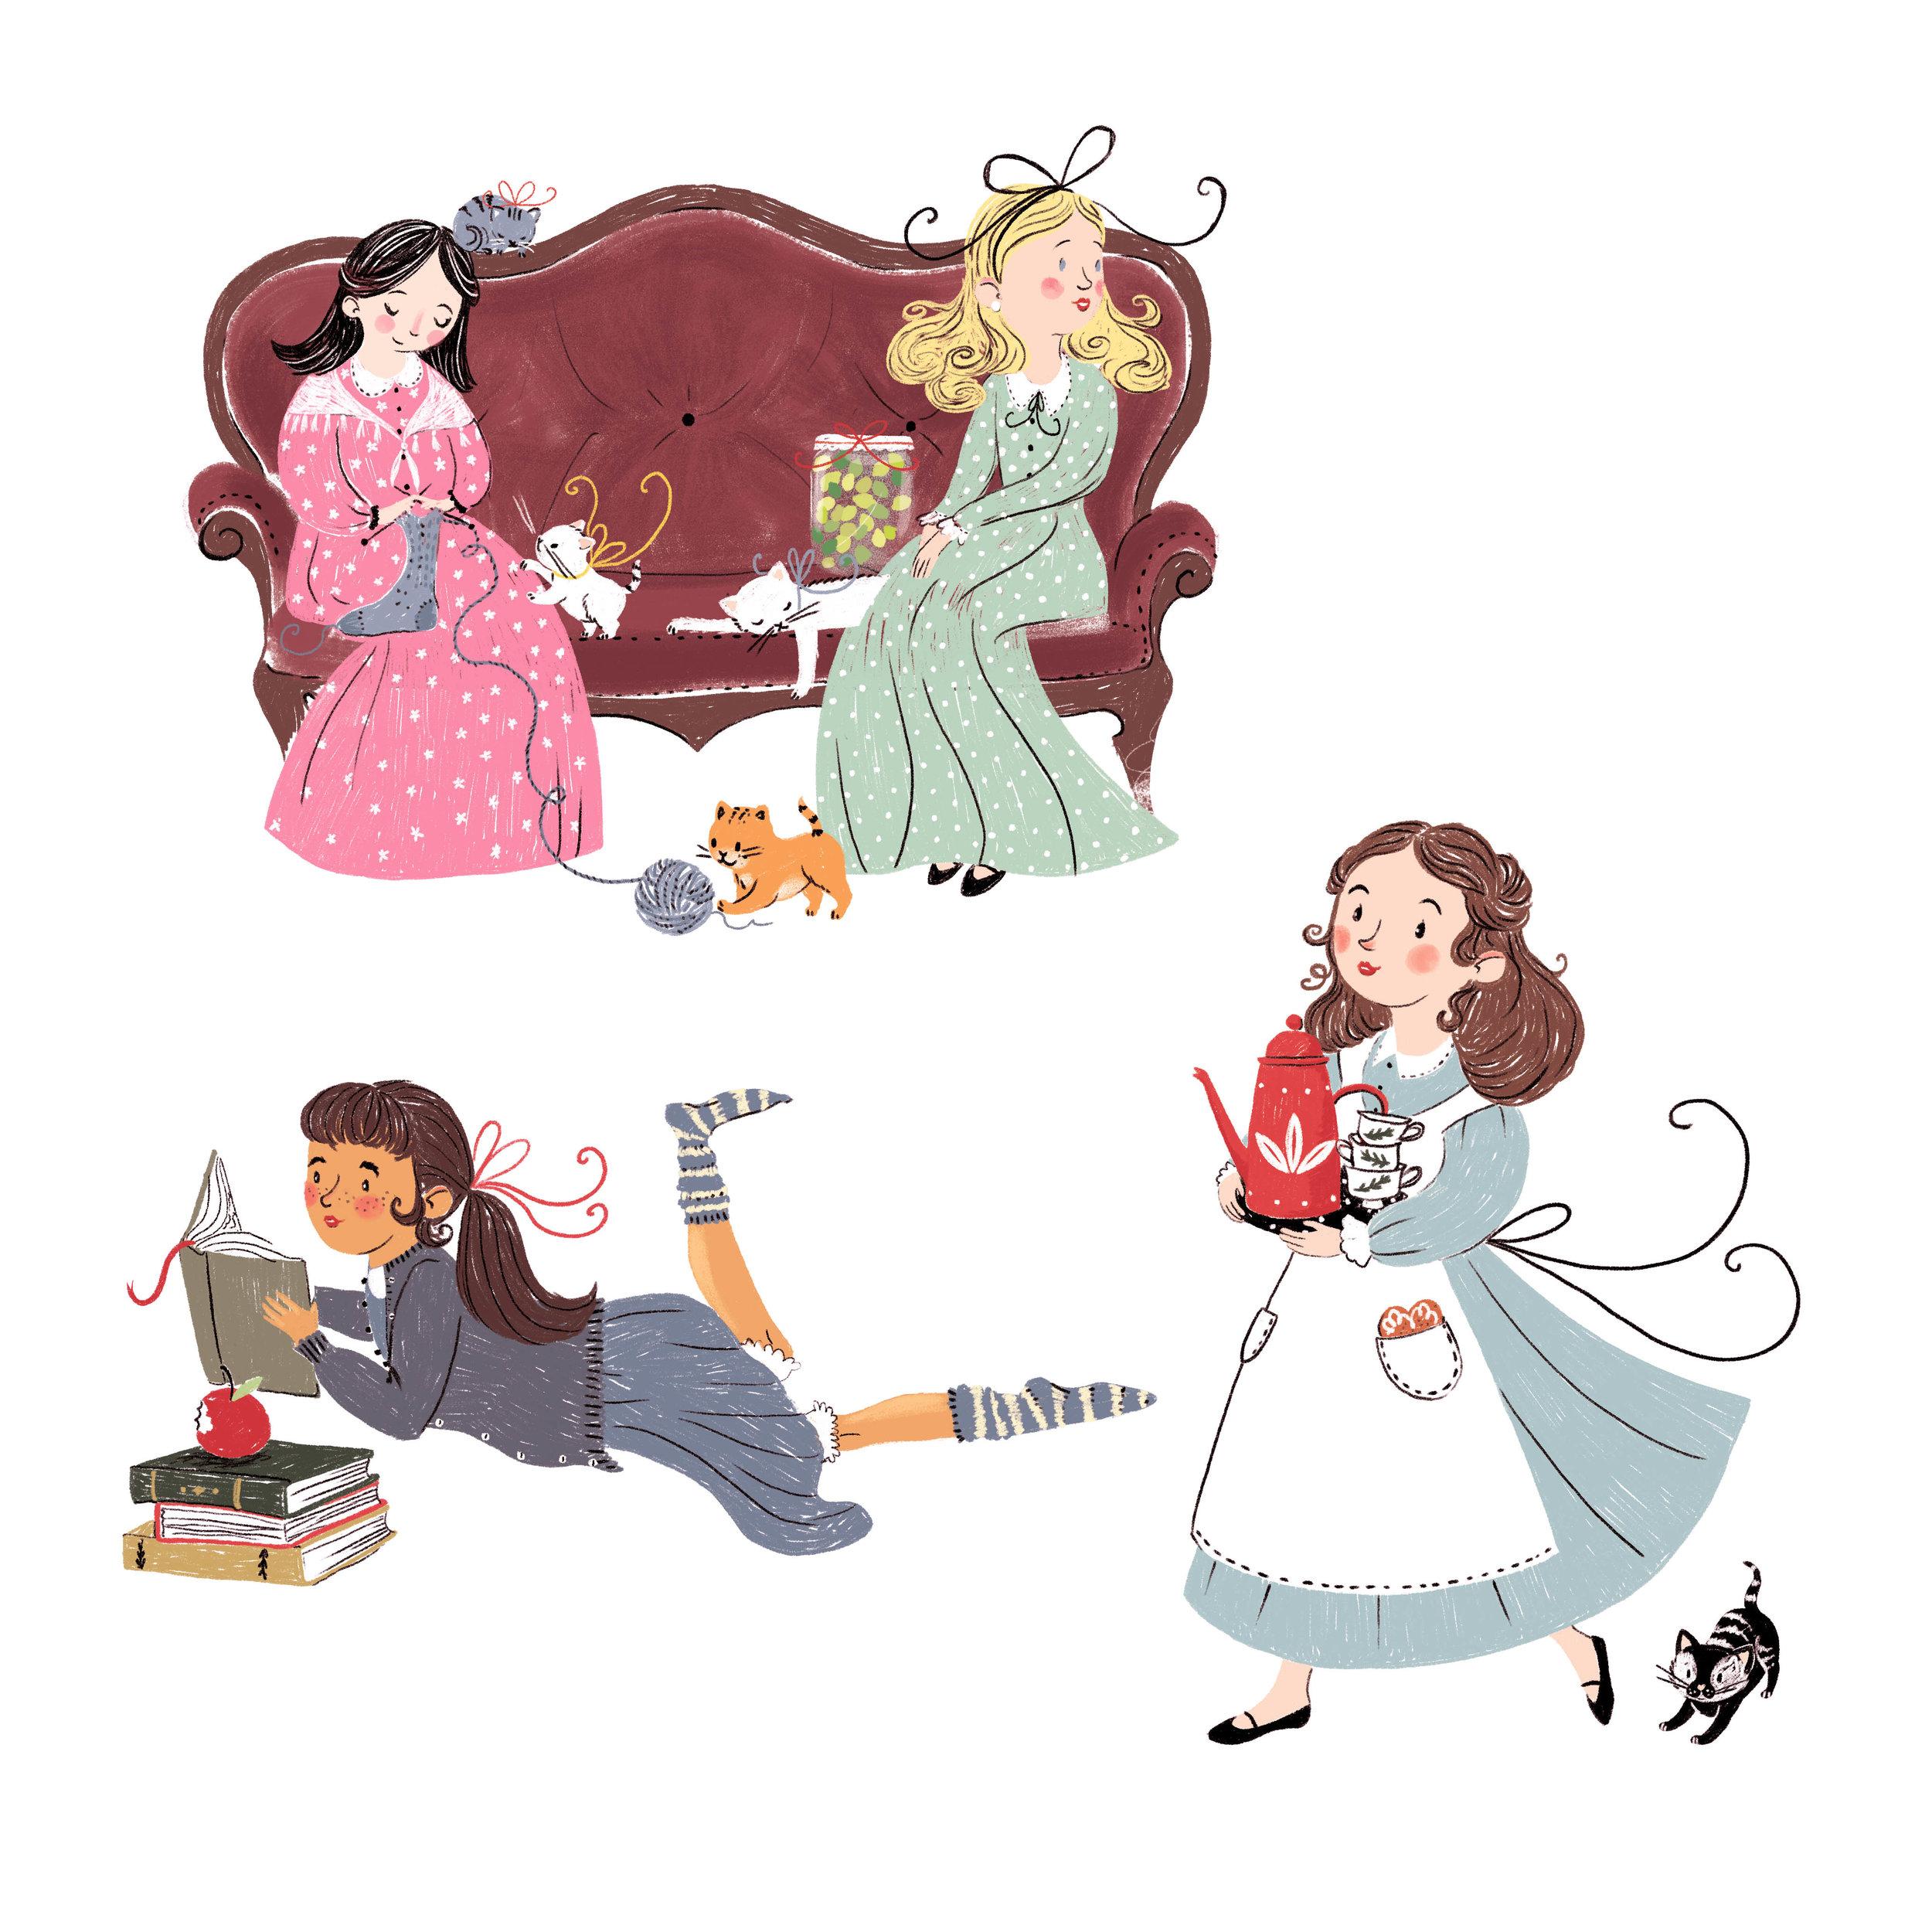 Little women_Charcters_JennyLovlie.jpg